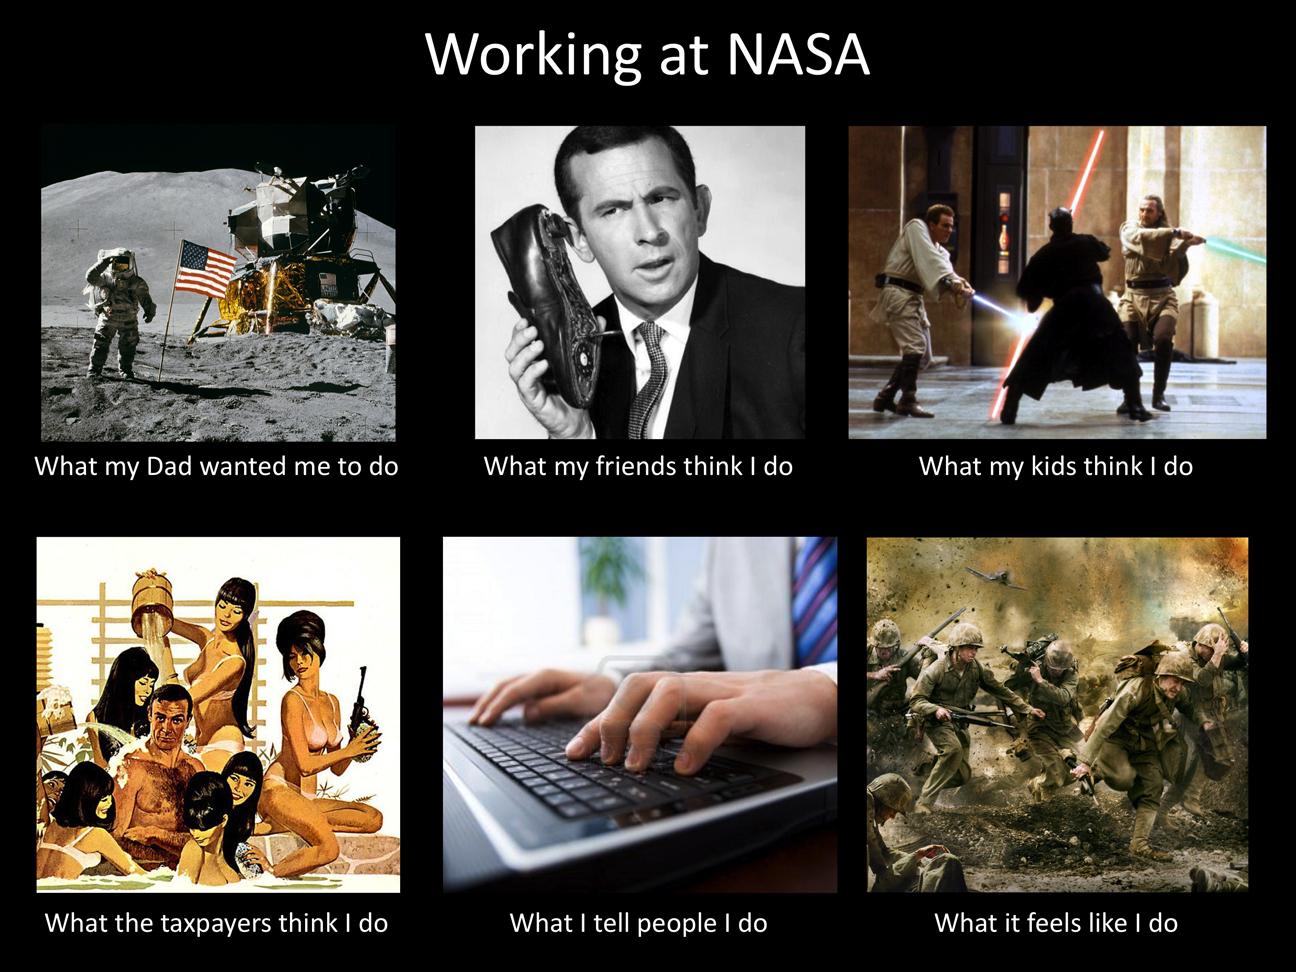 http://images.spaceref.com/news/2012/ooWorkinatNASA.jpg